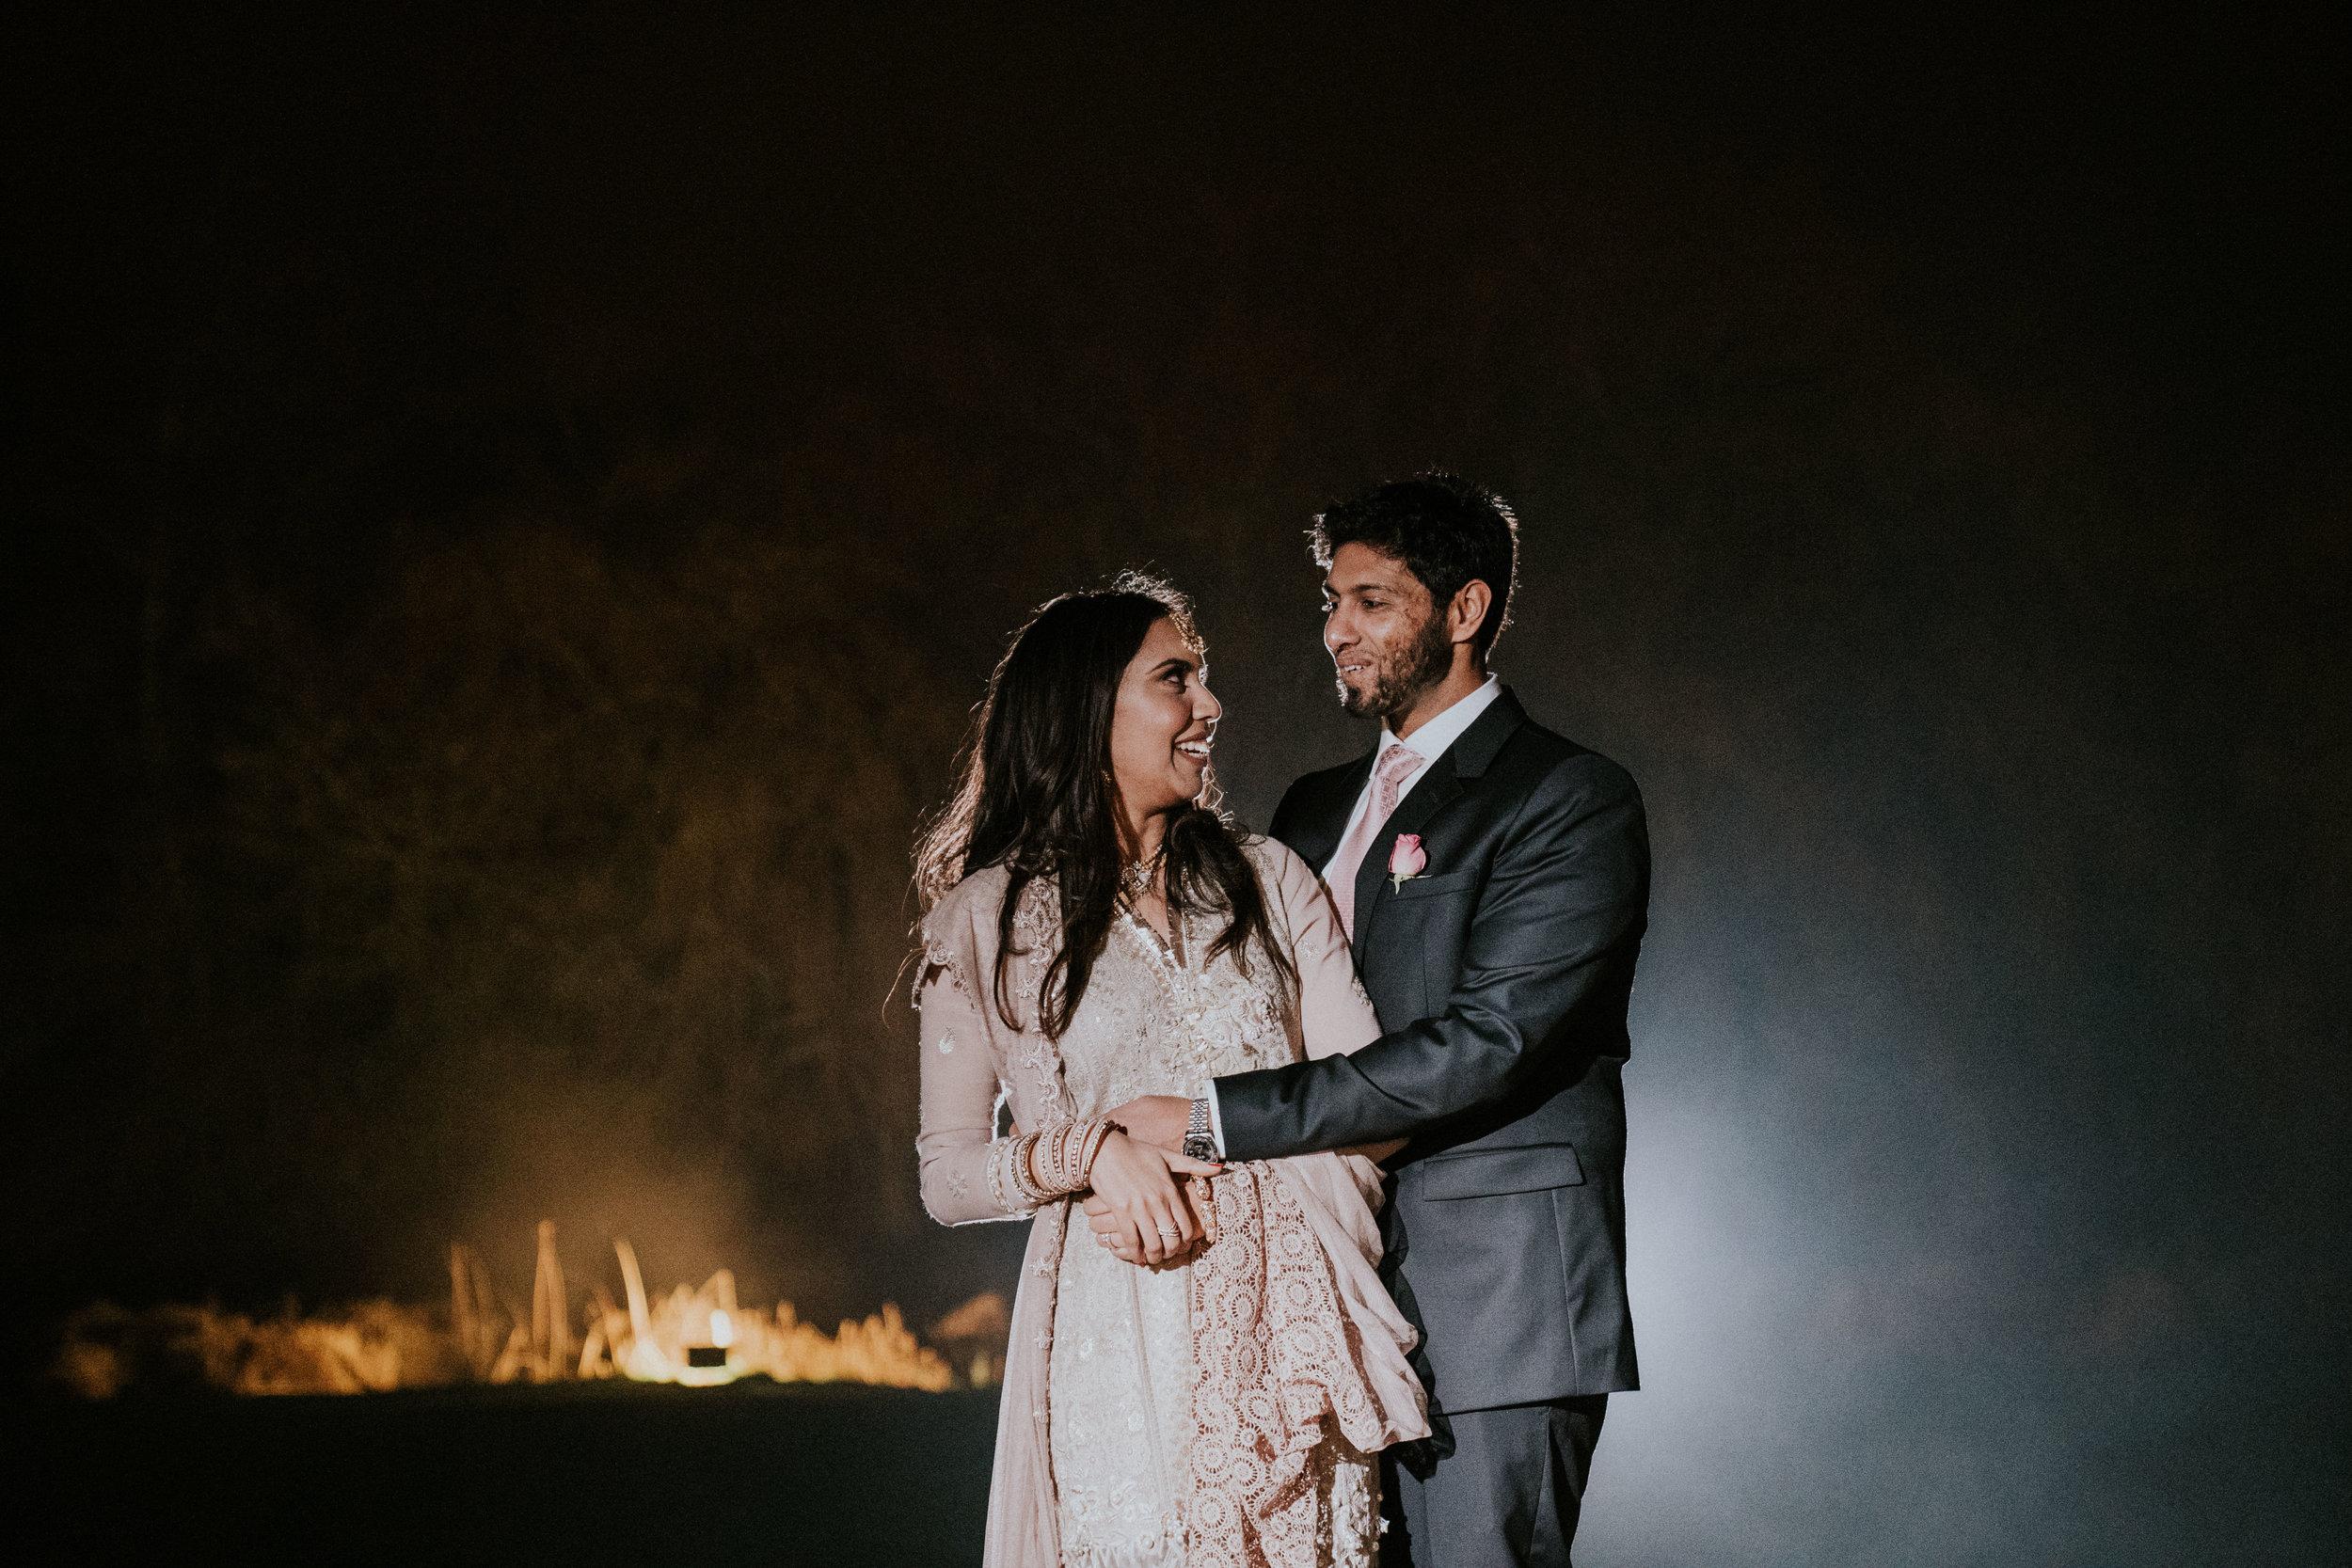 buckinghamshire-golf-club-winter-muslim-wedding-engagement-photography-videography-70